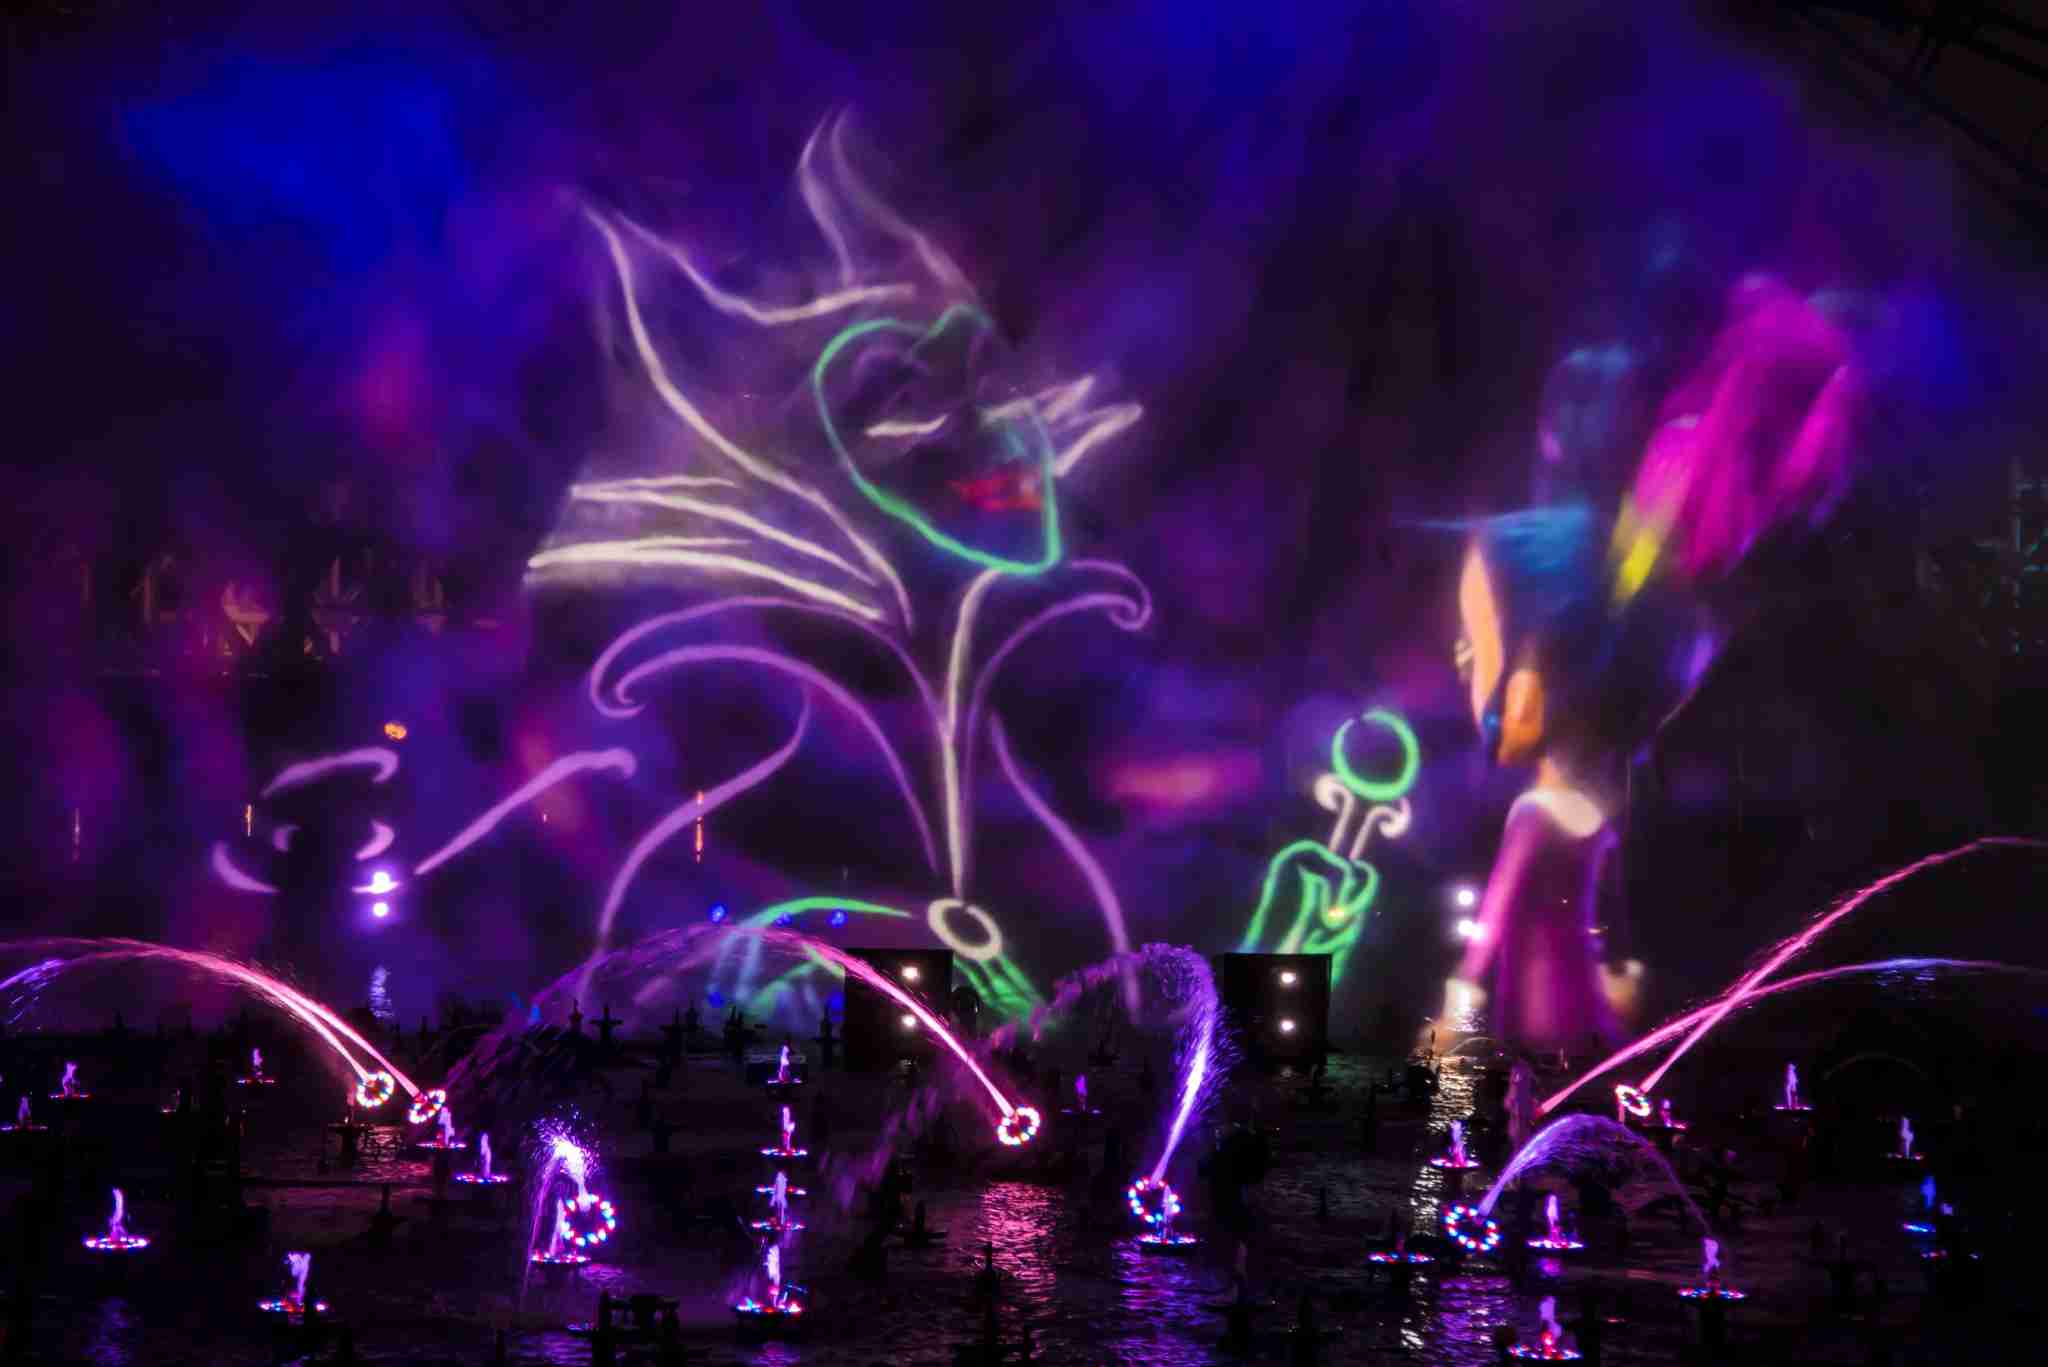 (Image credit: Joshua Sudock/Disneyland Resort)